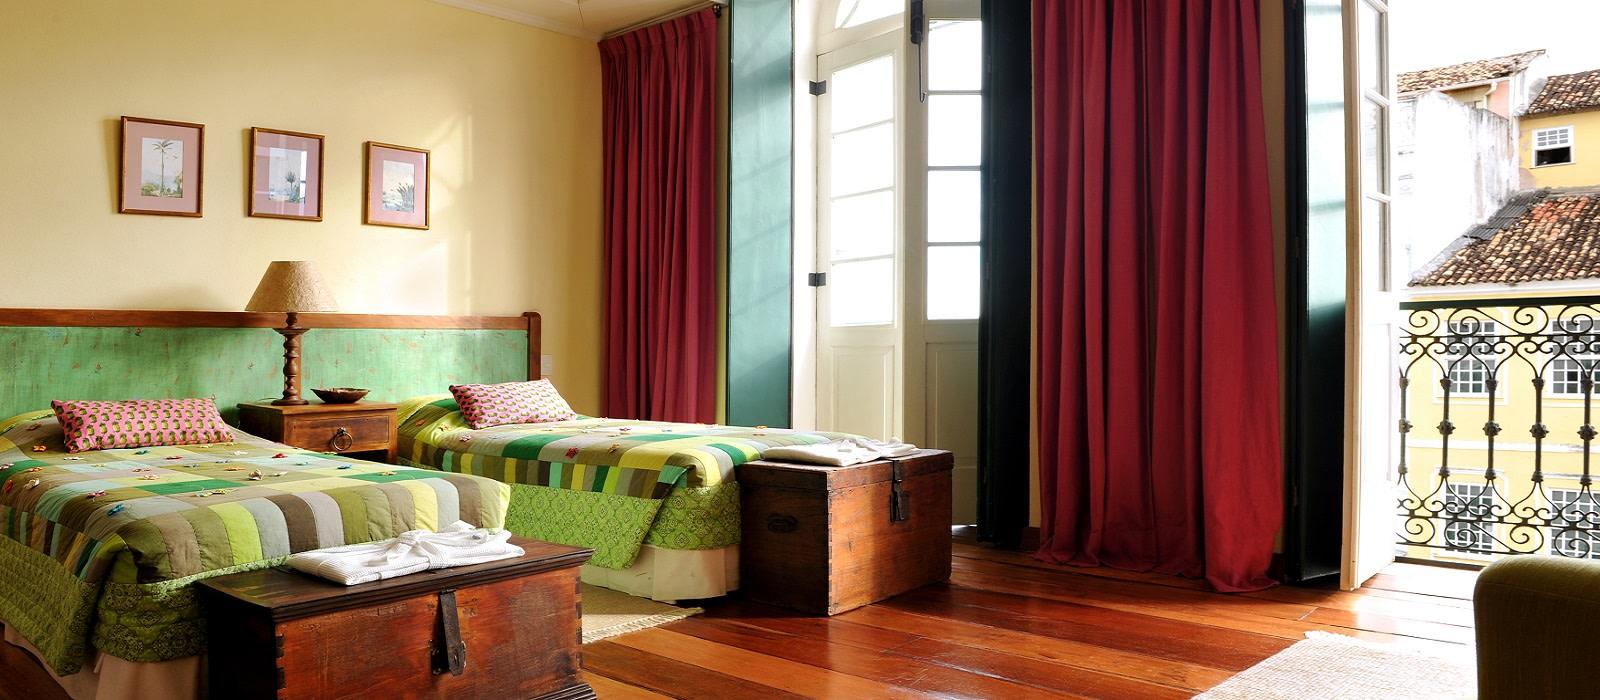 Hotel Villa Bahia Brasilien